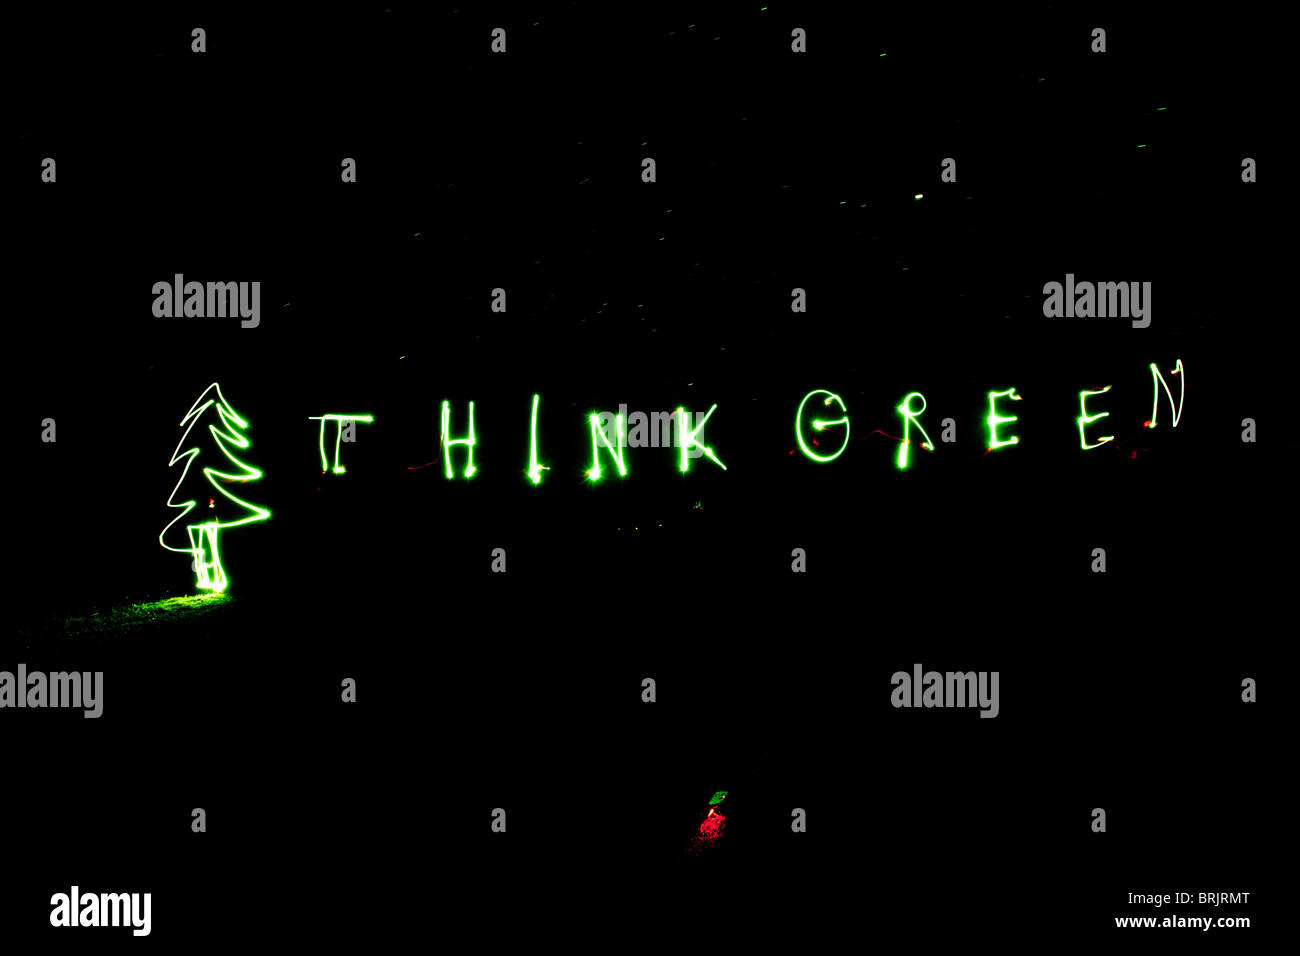 Lightpainting Rechtschreibung Think Green in Idaho. Stockfoto